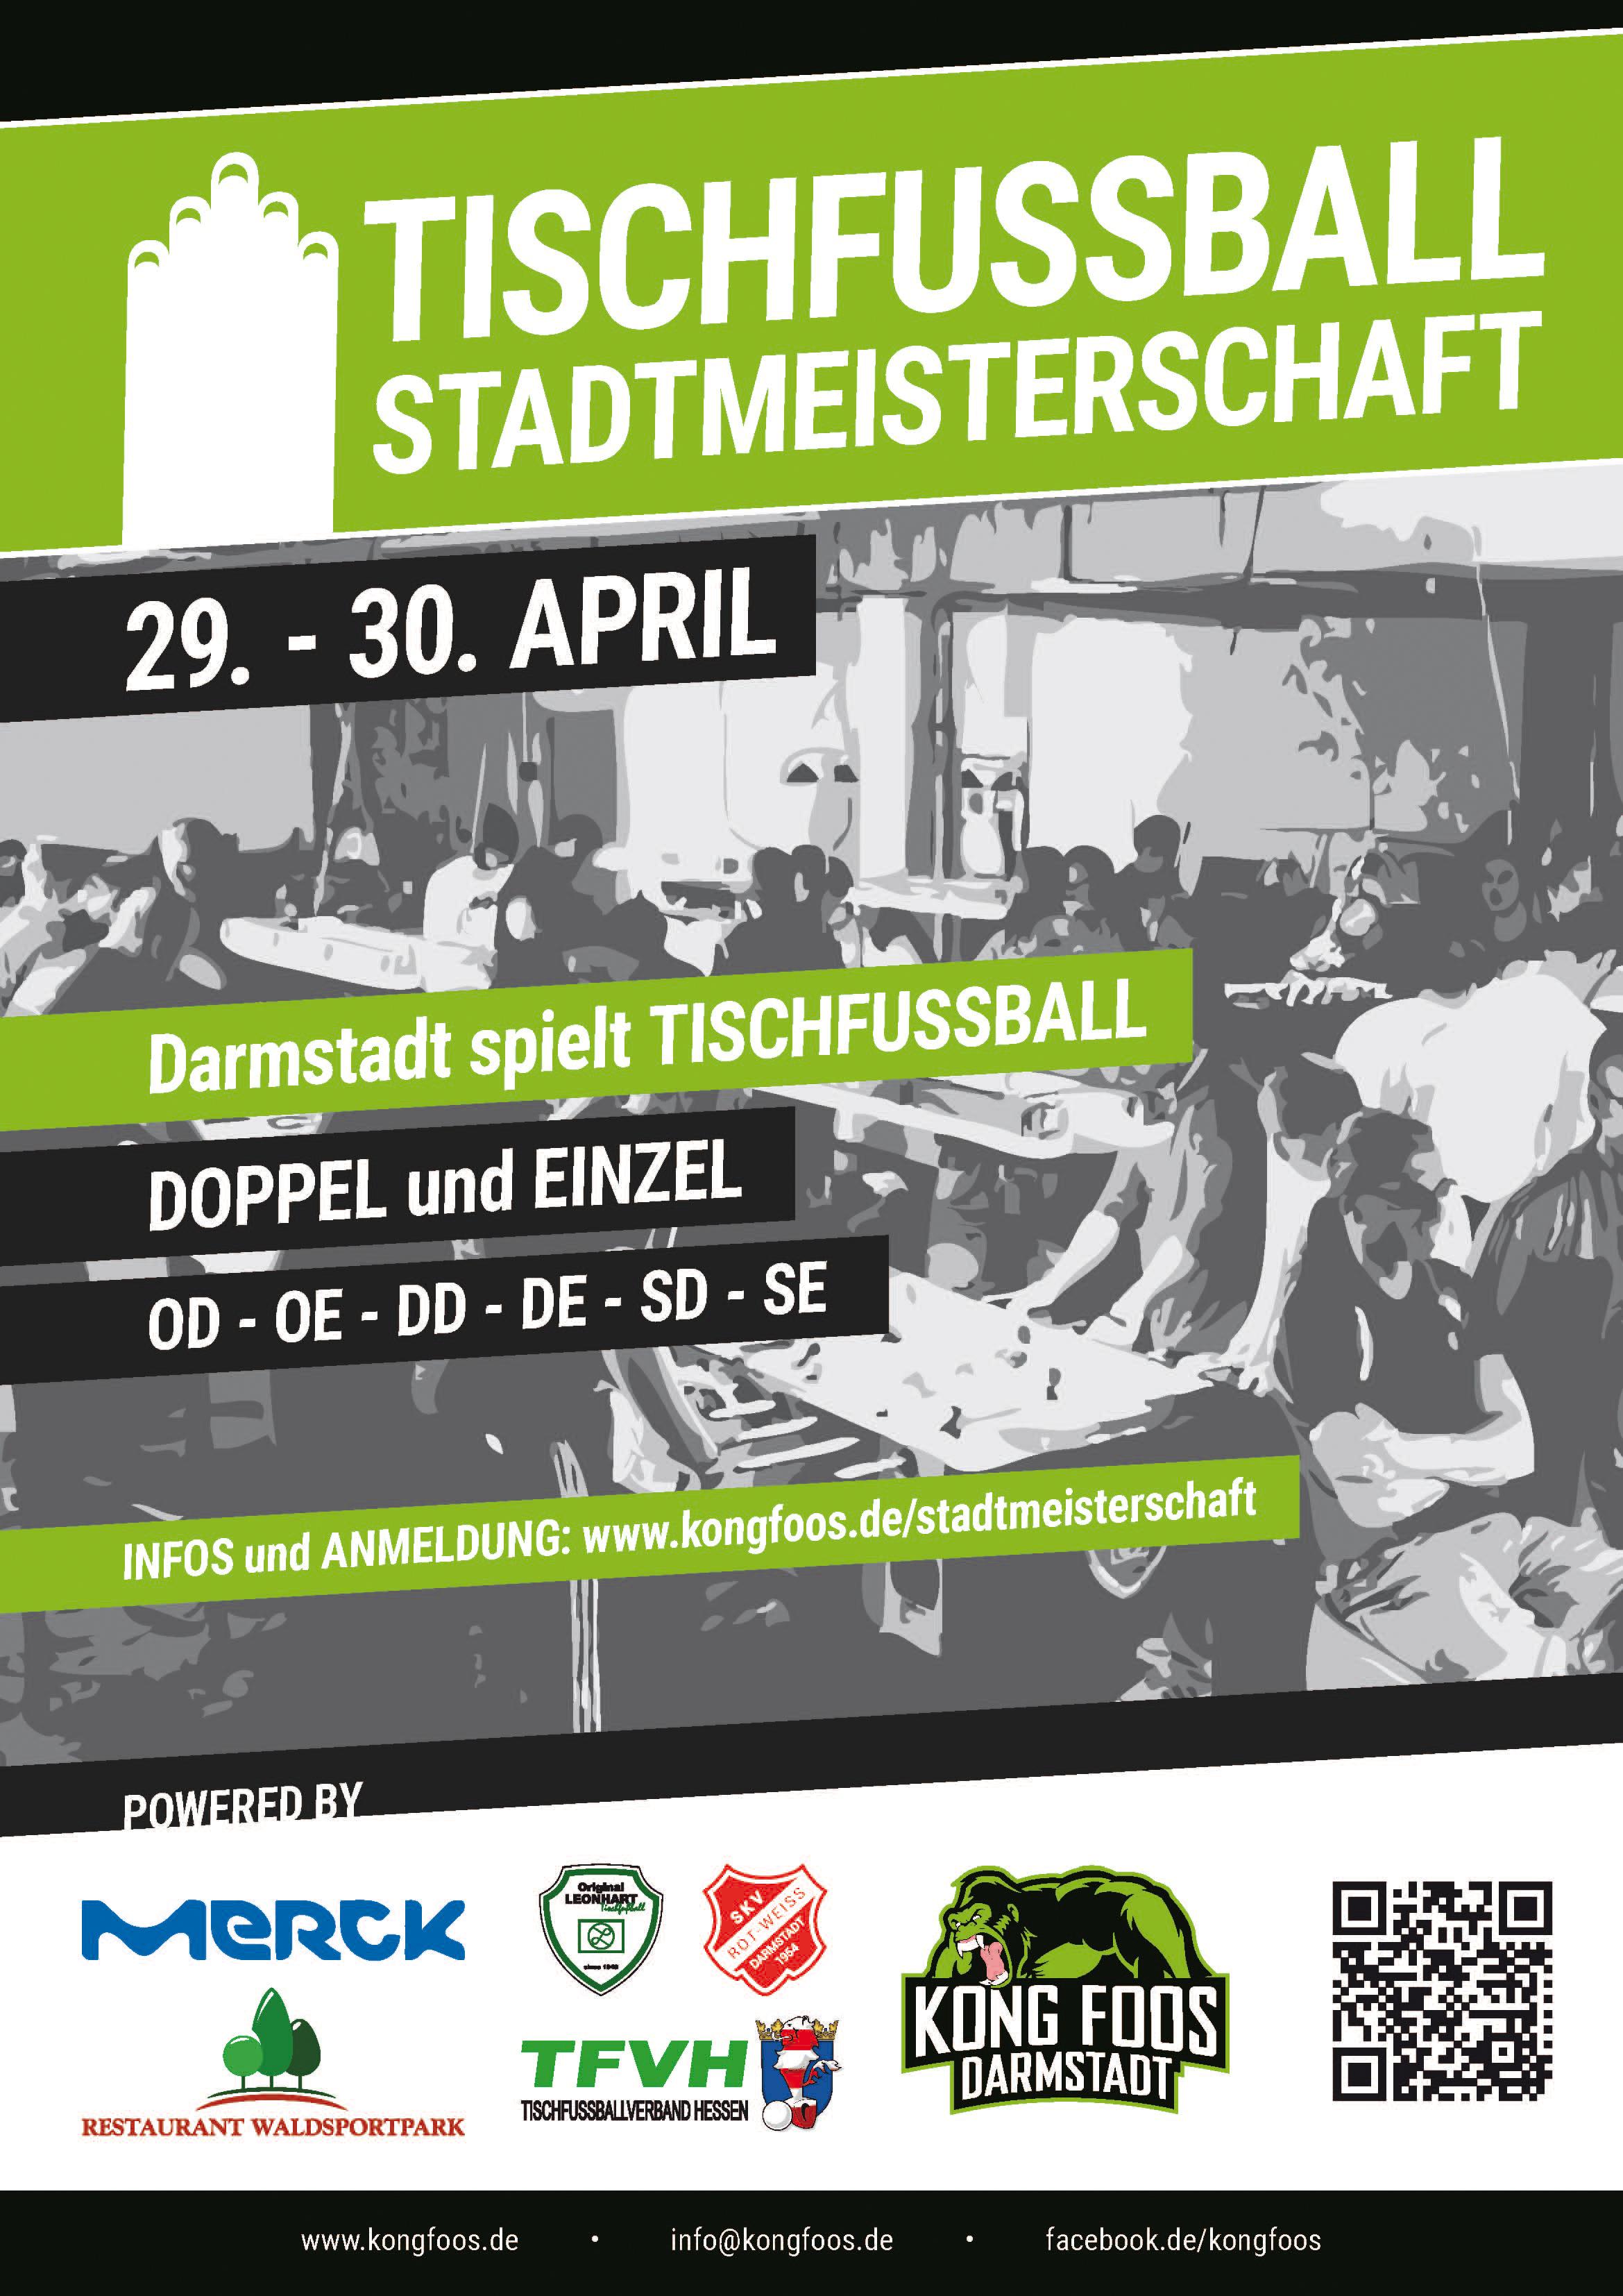 Darmstadt Stadtmeisterschaft 2017